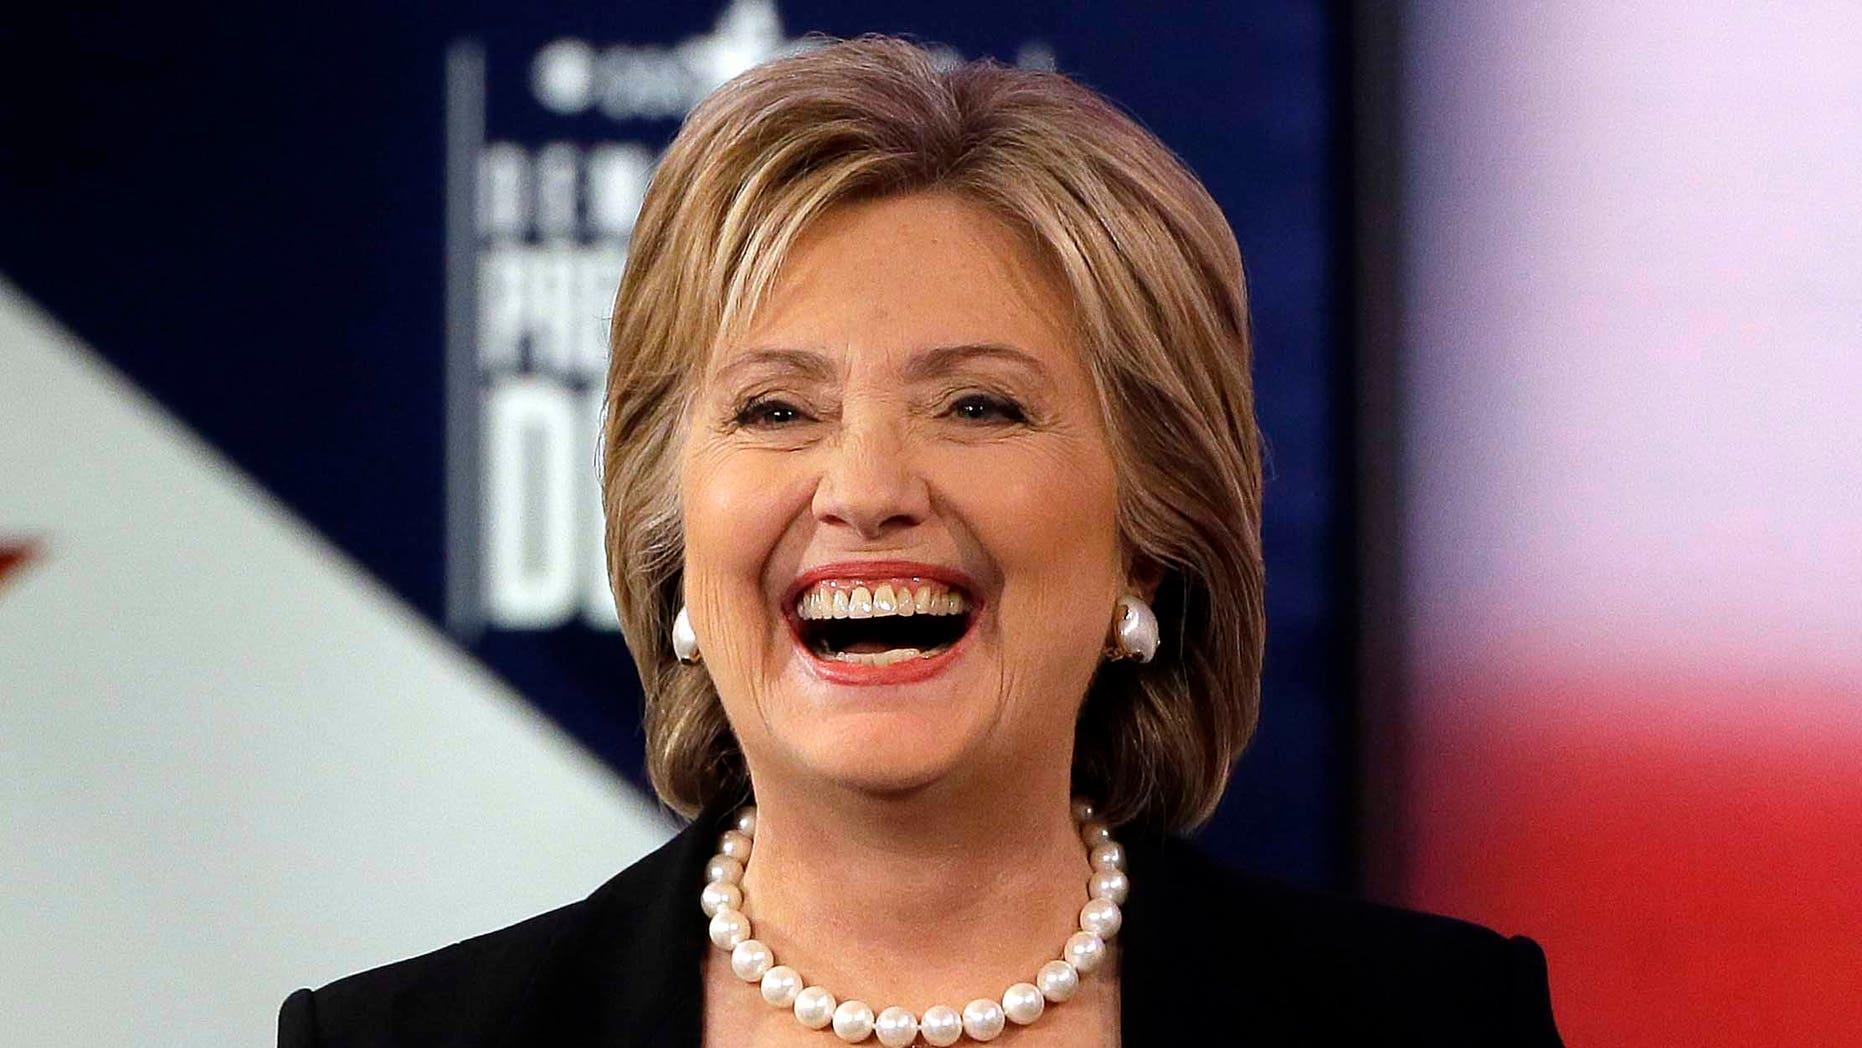 Hillary Clinton during a commercial break at a Democratic presidential primary debate, Saturday, Nov. 14, 2015, in Des Moines, Iowa.